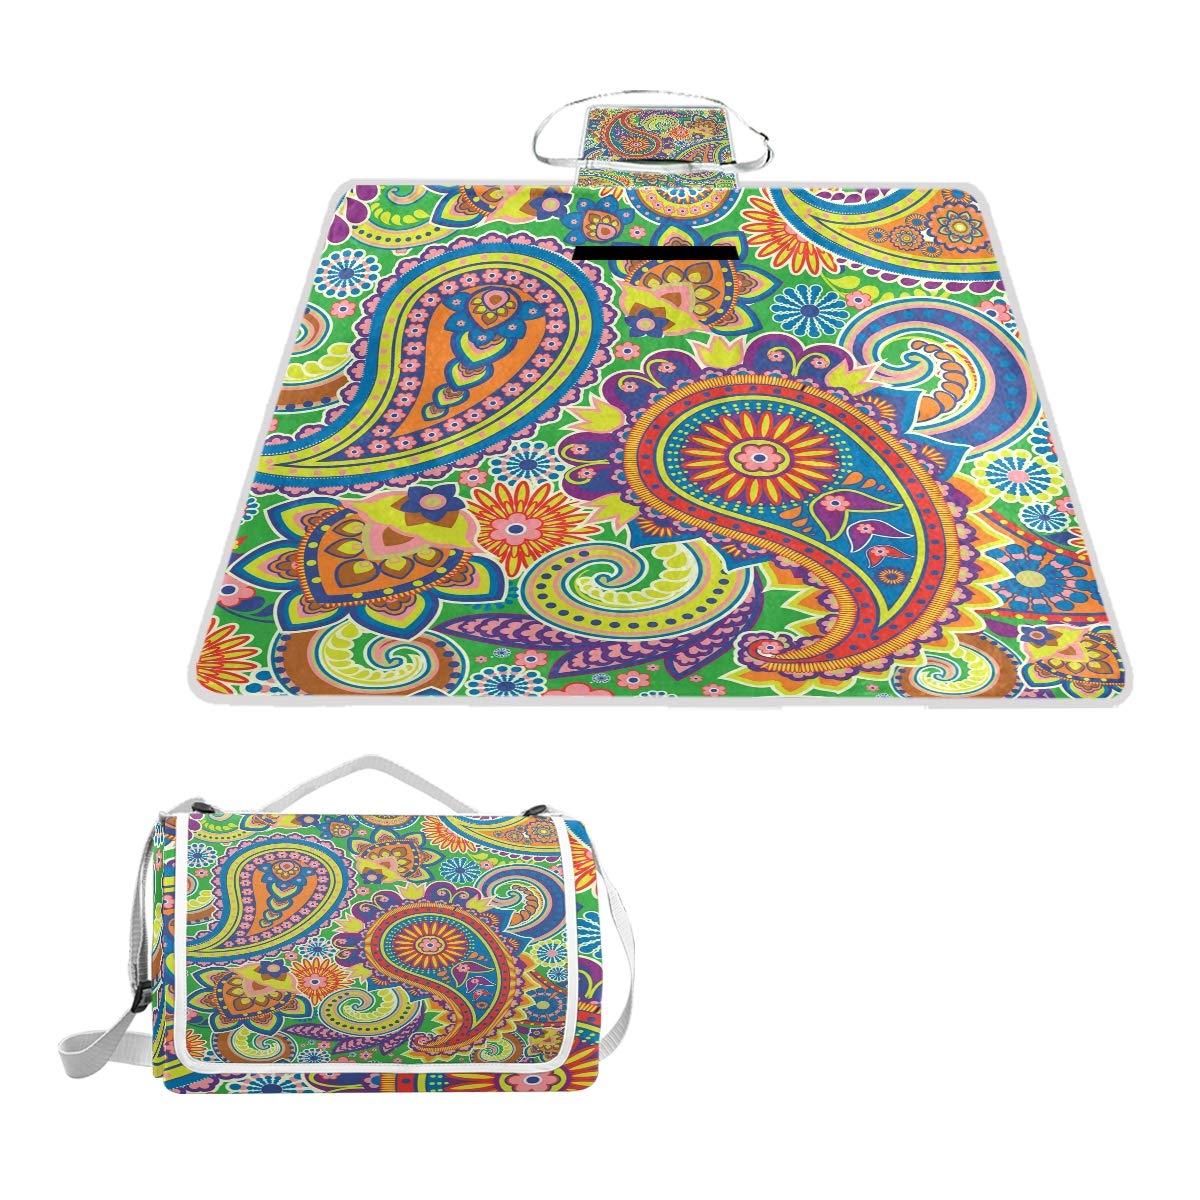 Anyangquji Seamless Pattern Based On Traditional Asian Elements Paisley Picnic Blanket 57''x59''